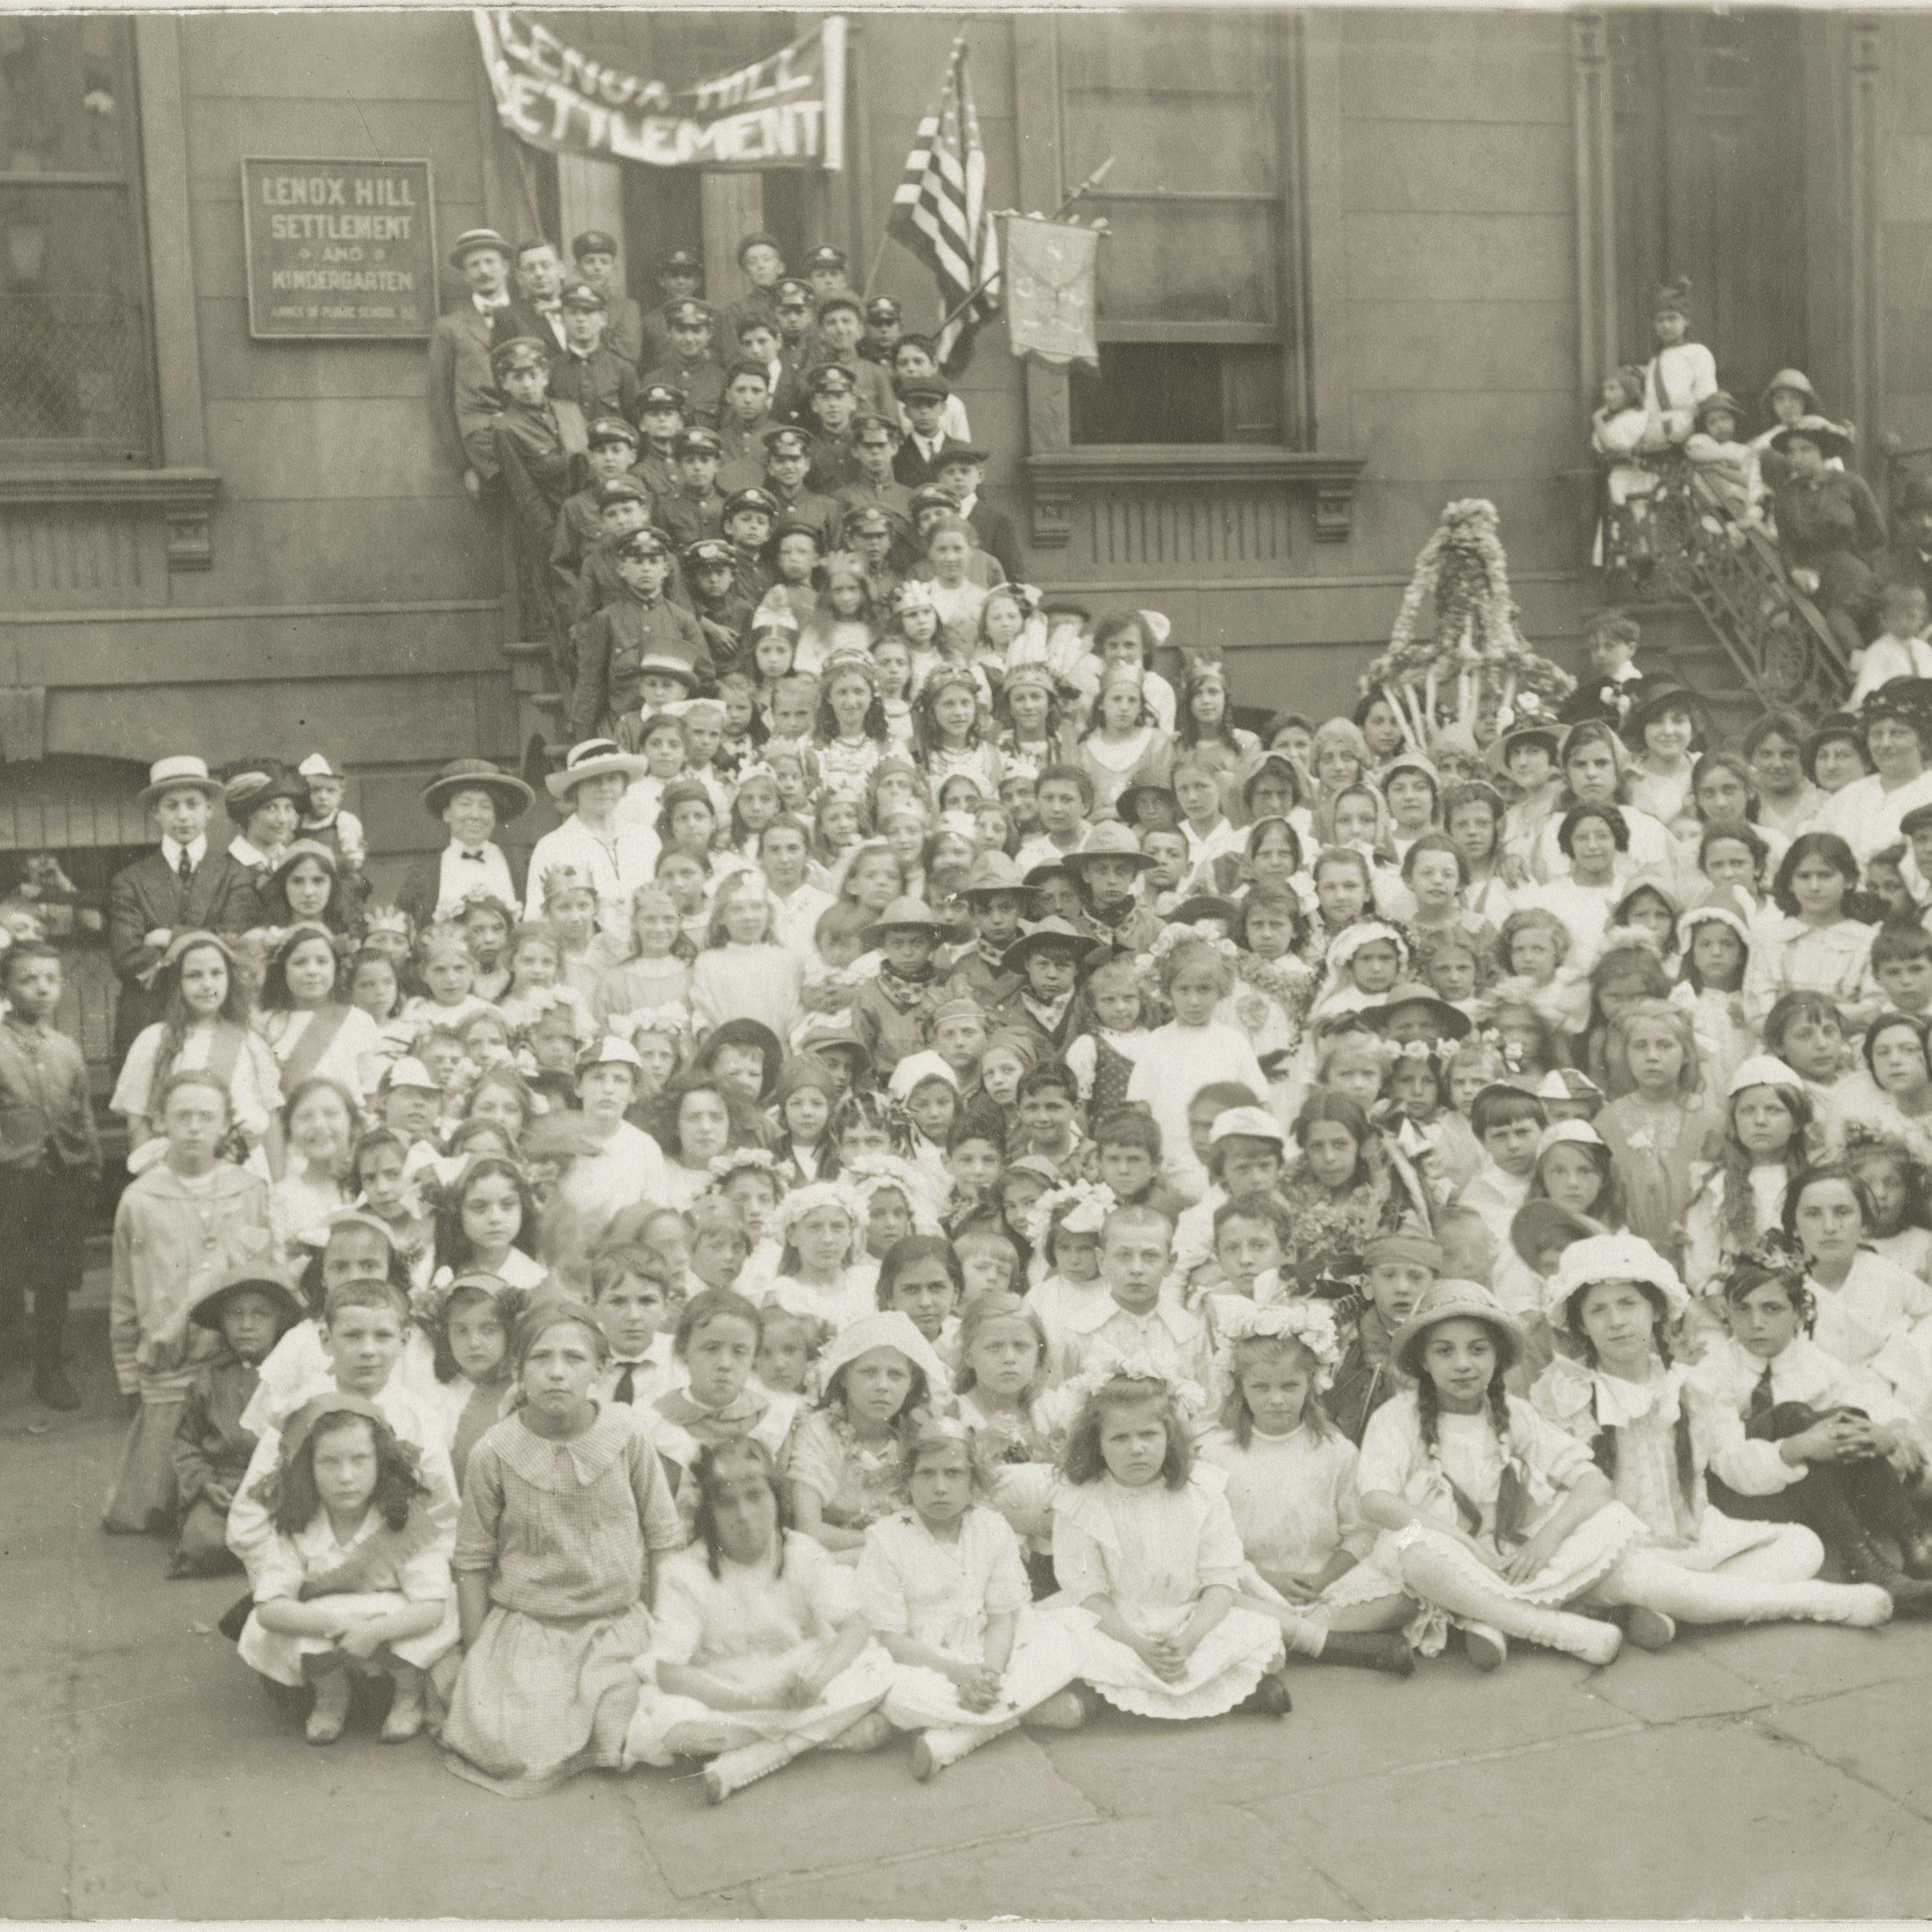 1894 - Kindergarten Front Steps - Caption 'Lenox Hill Settlement was Born'.jpg